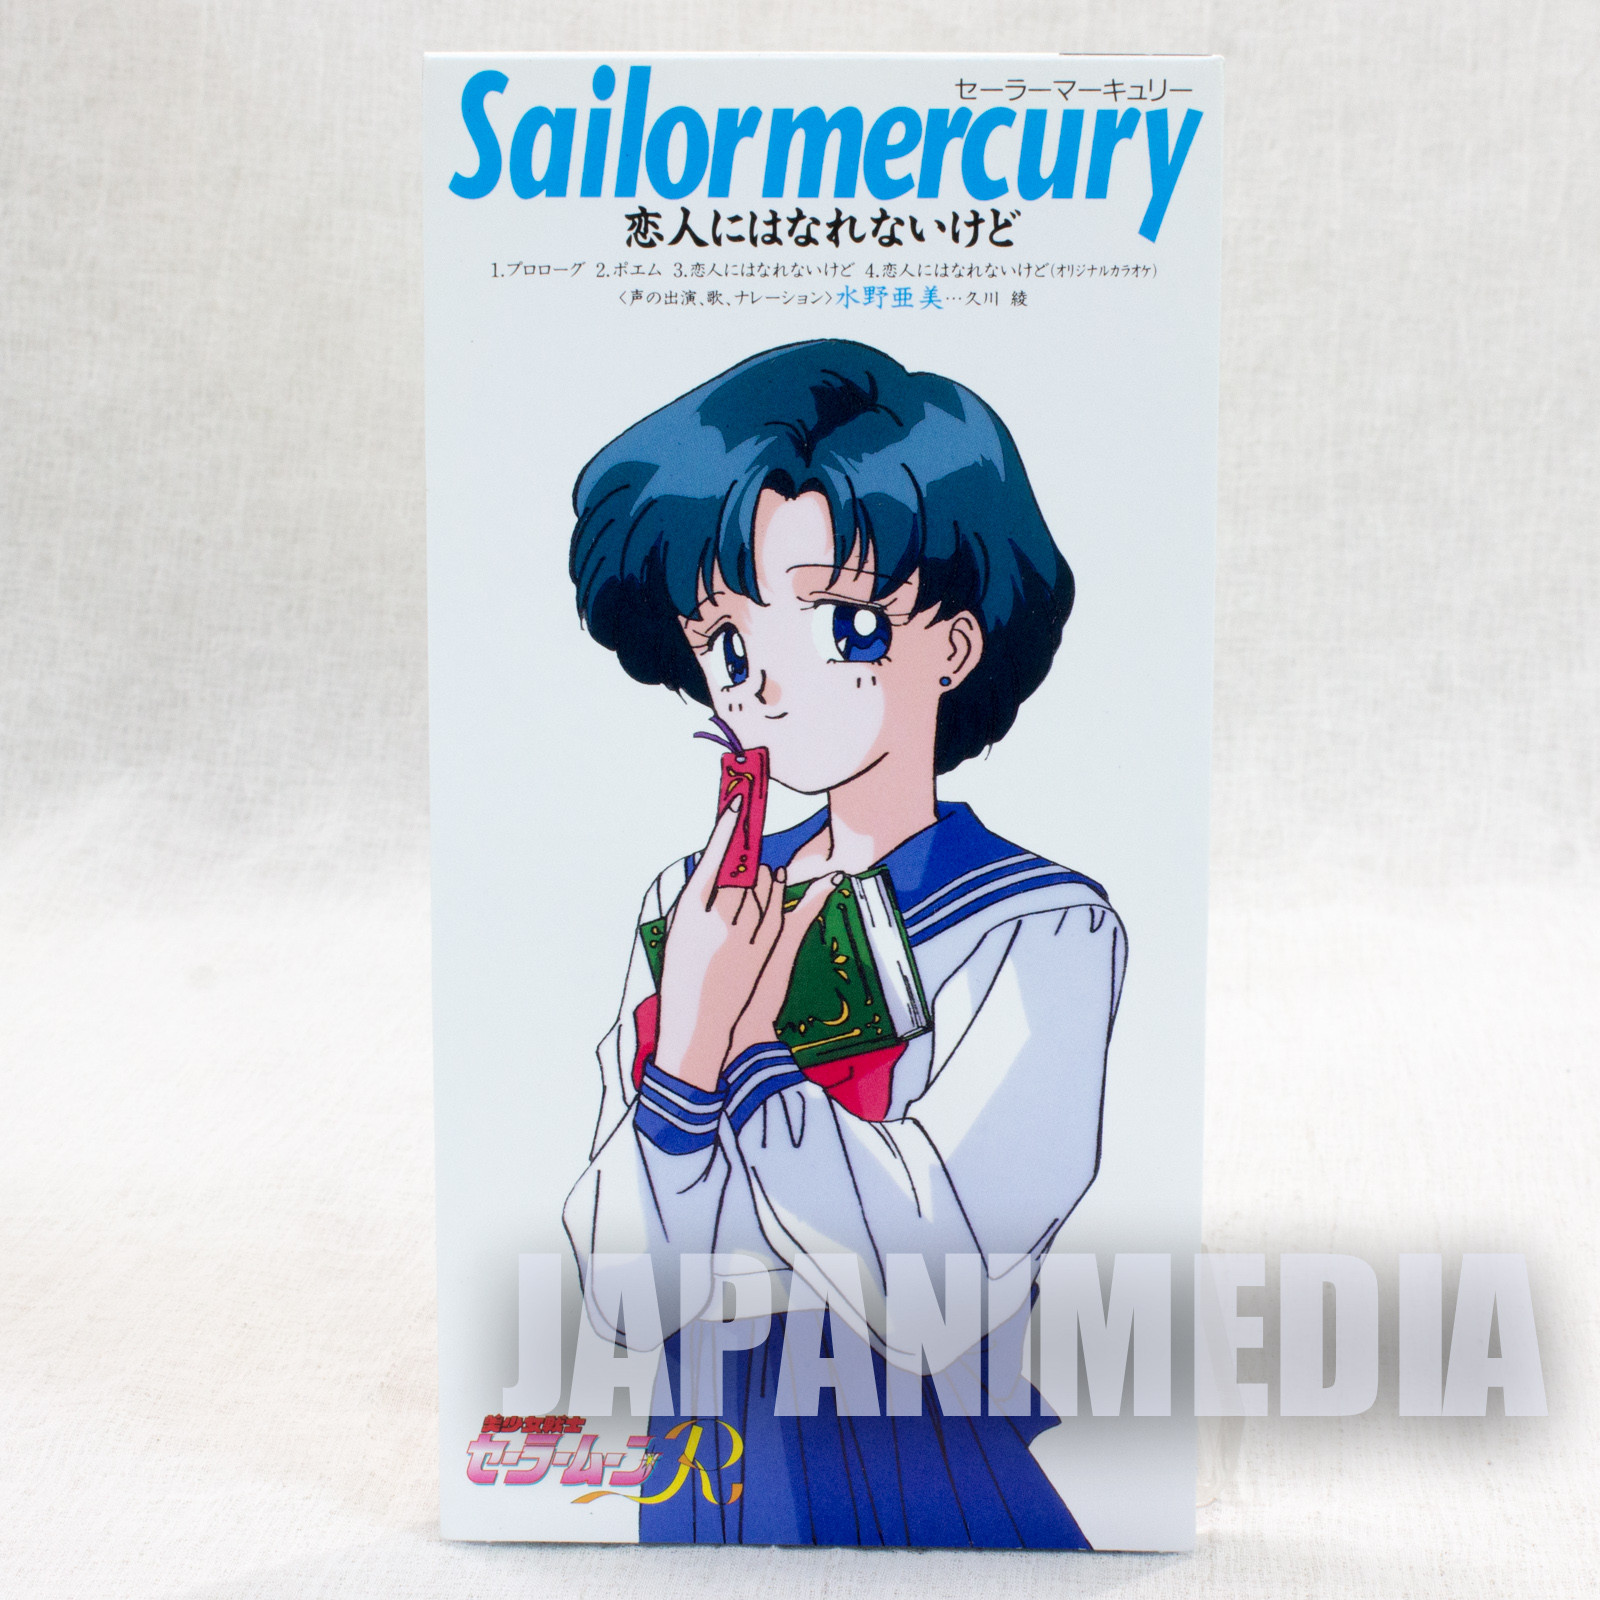 Sailor Moon R  Ami Mizuno (Sailor Mercury) Character Song JAPAN 3 inch 8cm CD Single ANIME